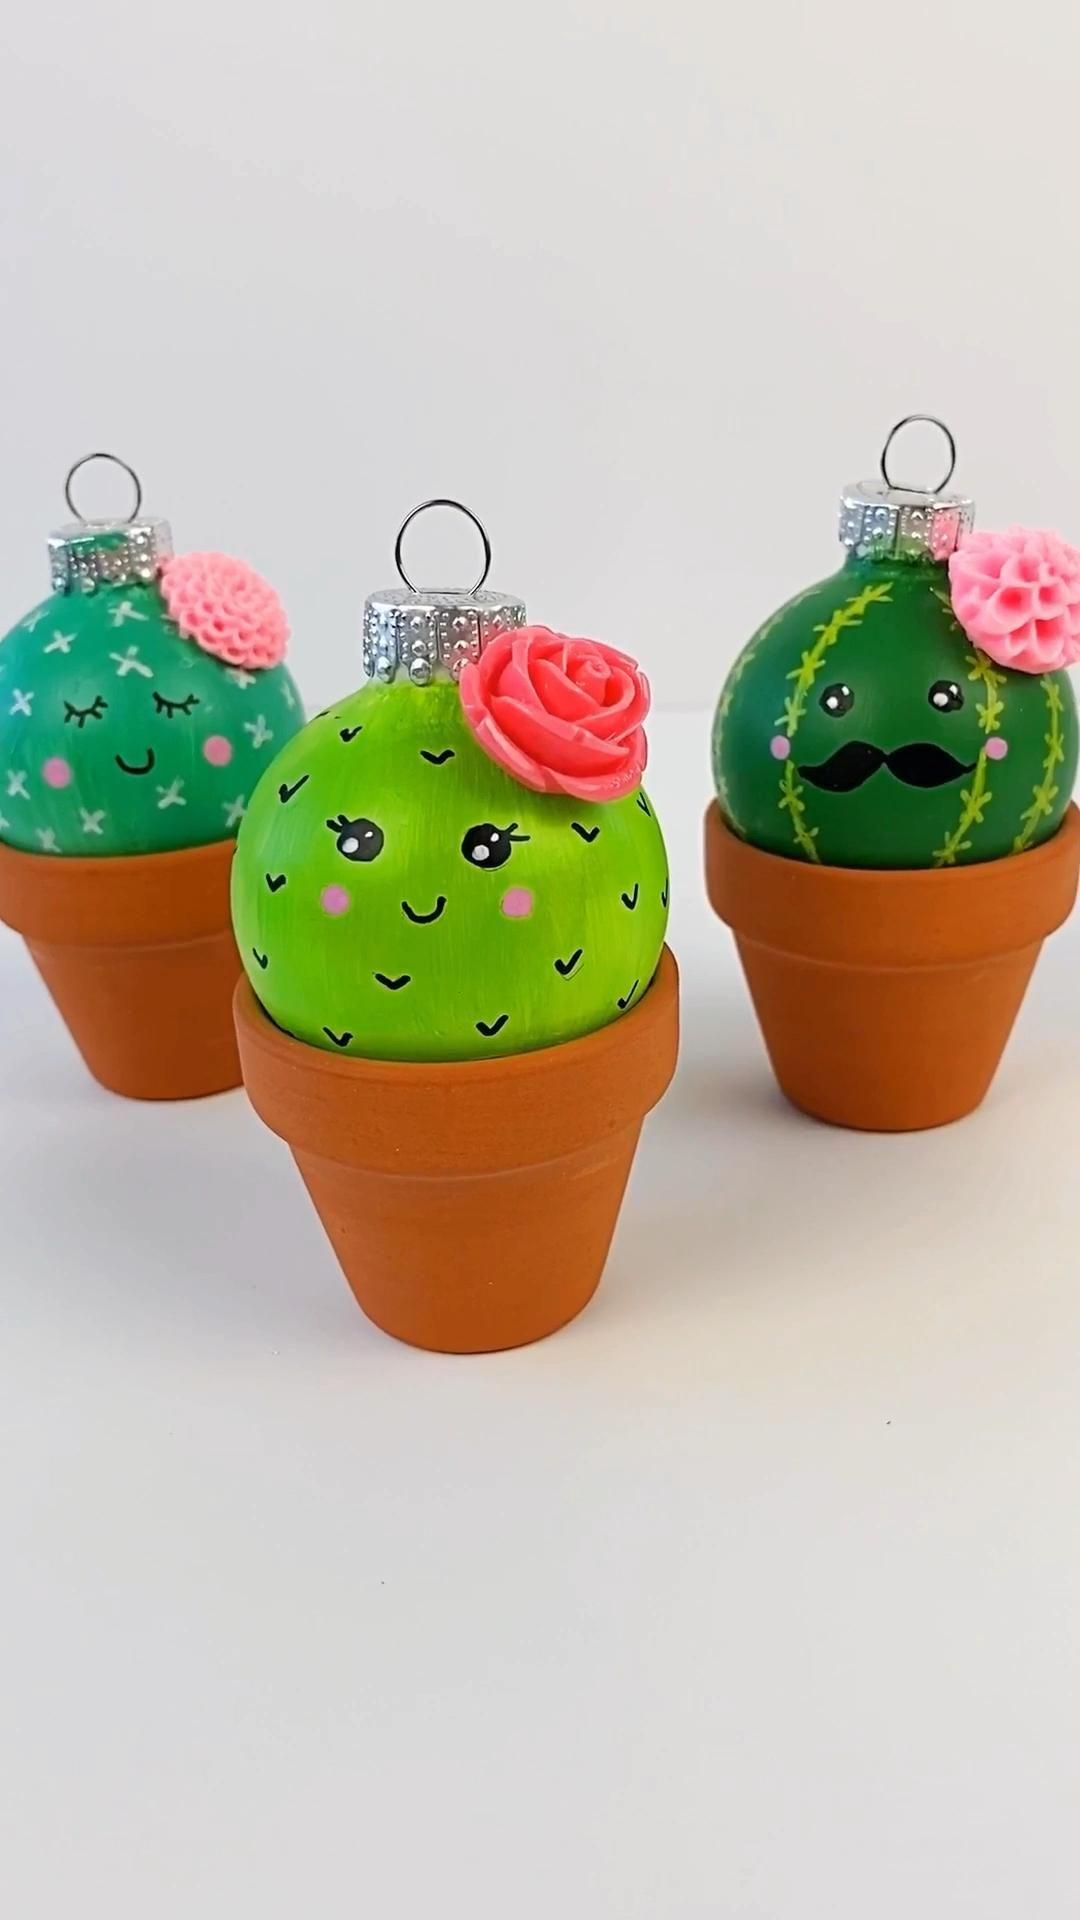 Cactus Ornament Craft for Christmas